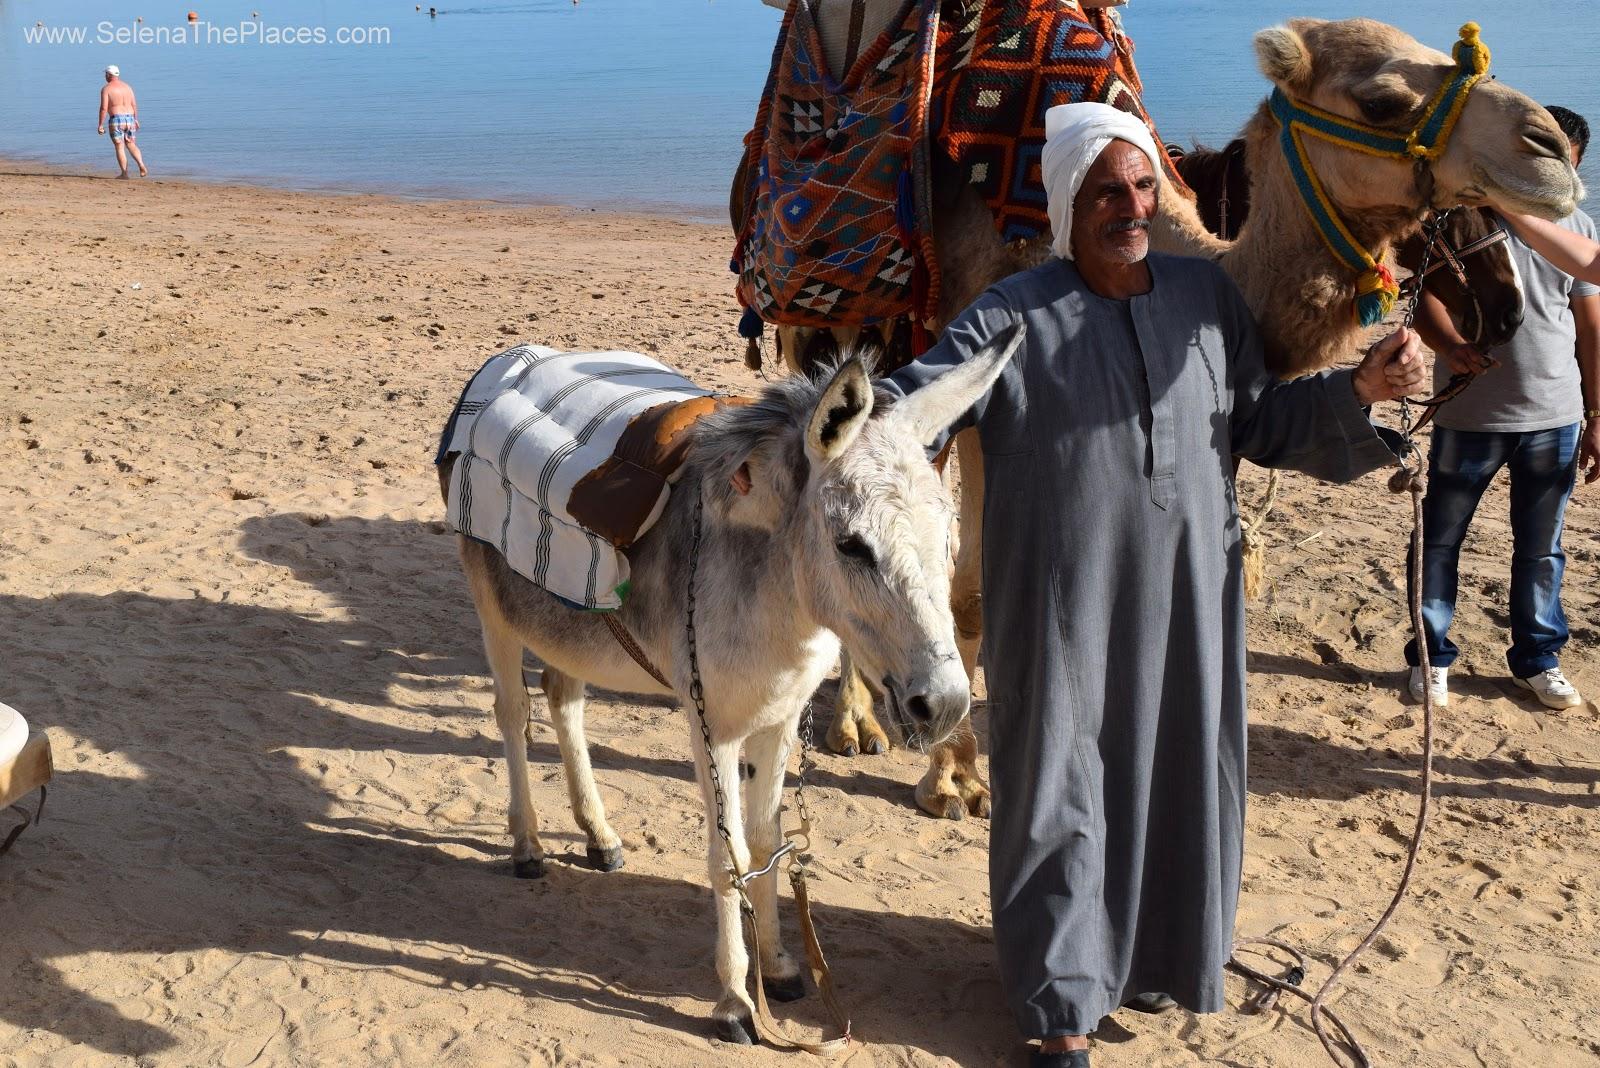 Casanova the Camel, Hurghada Egypt